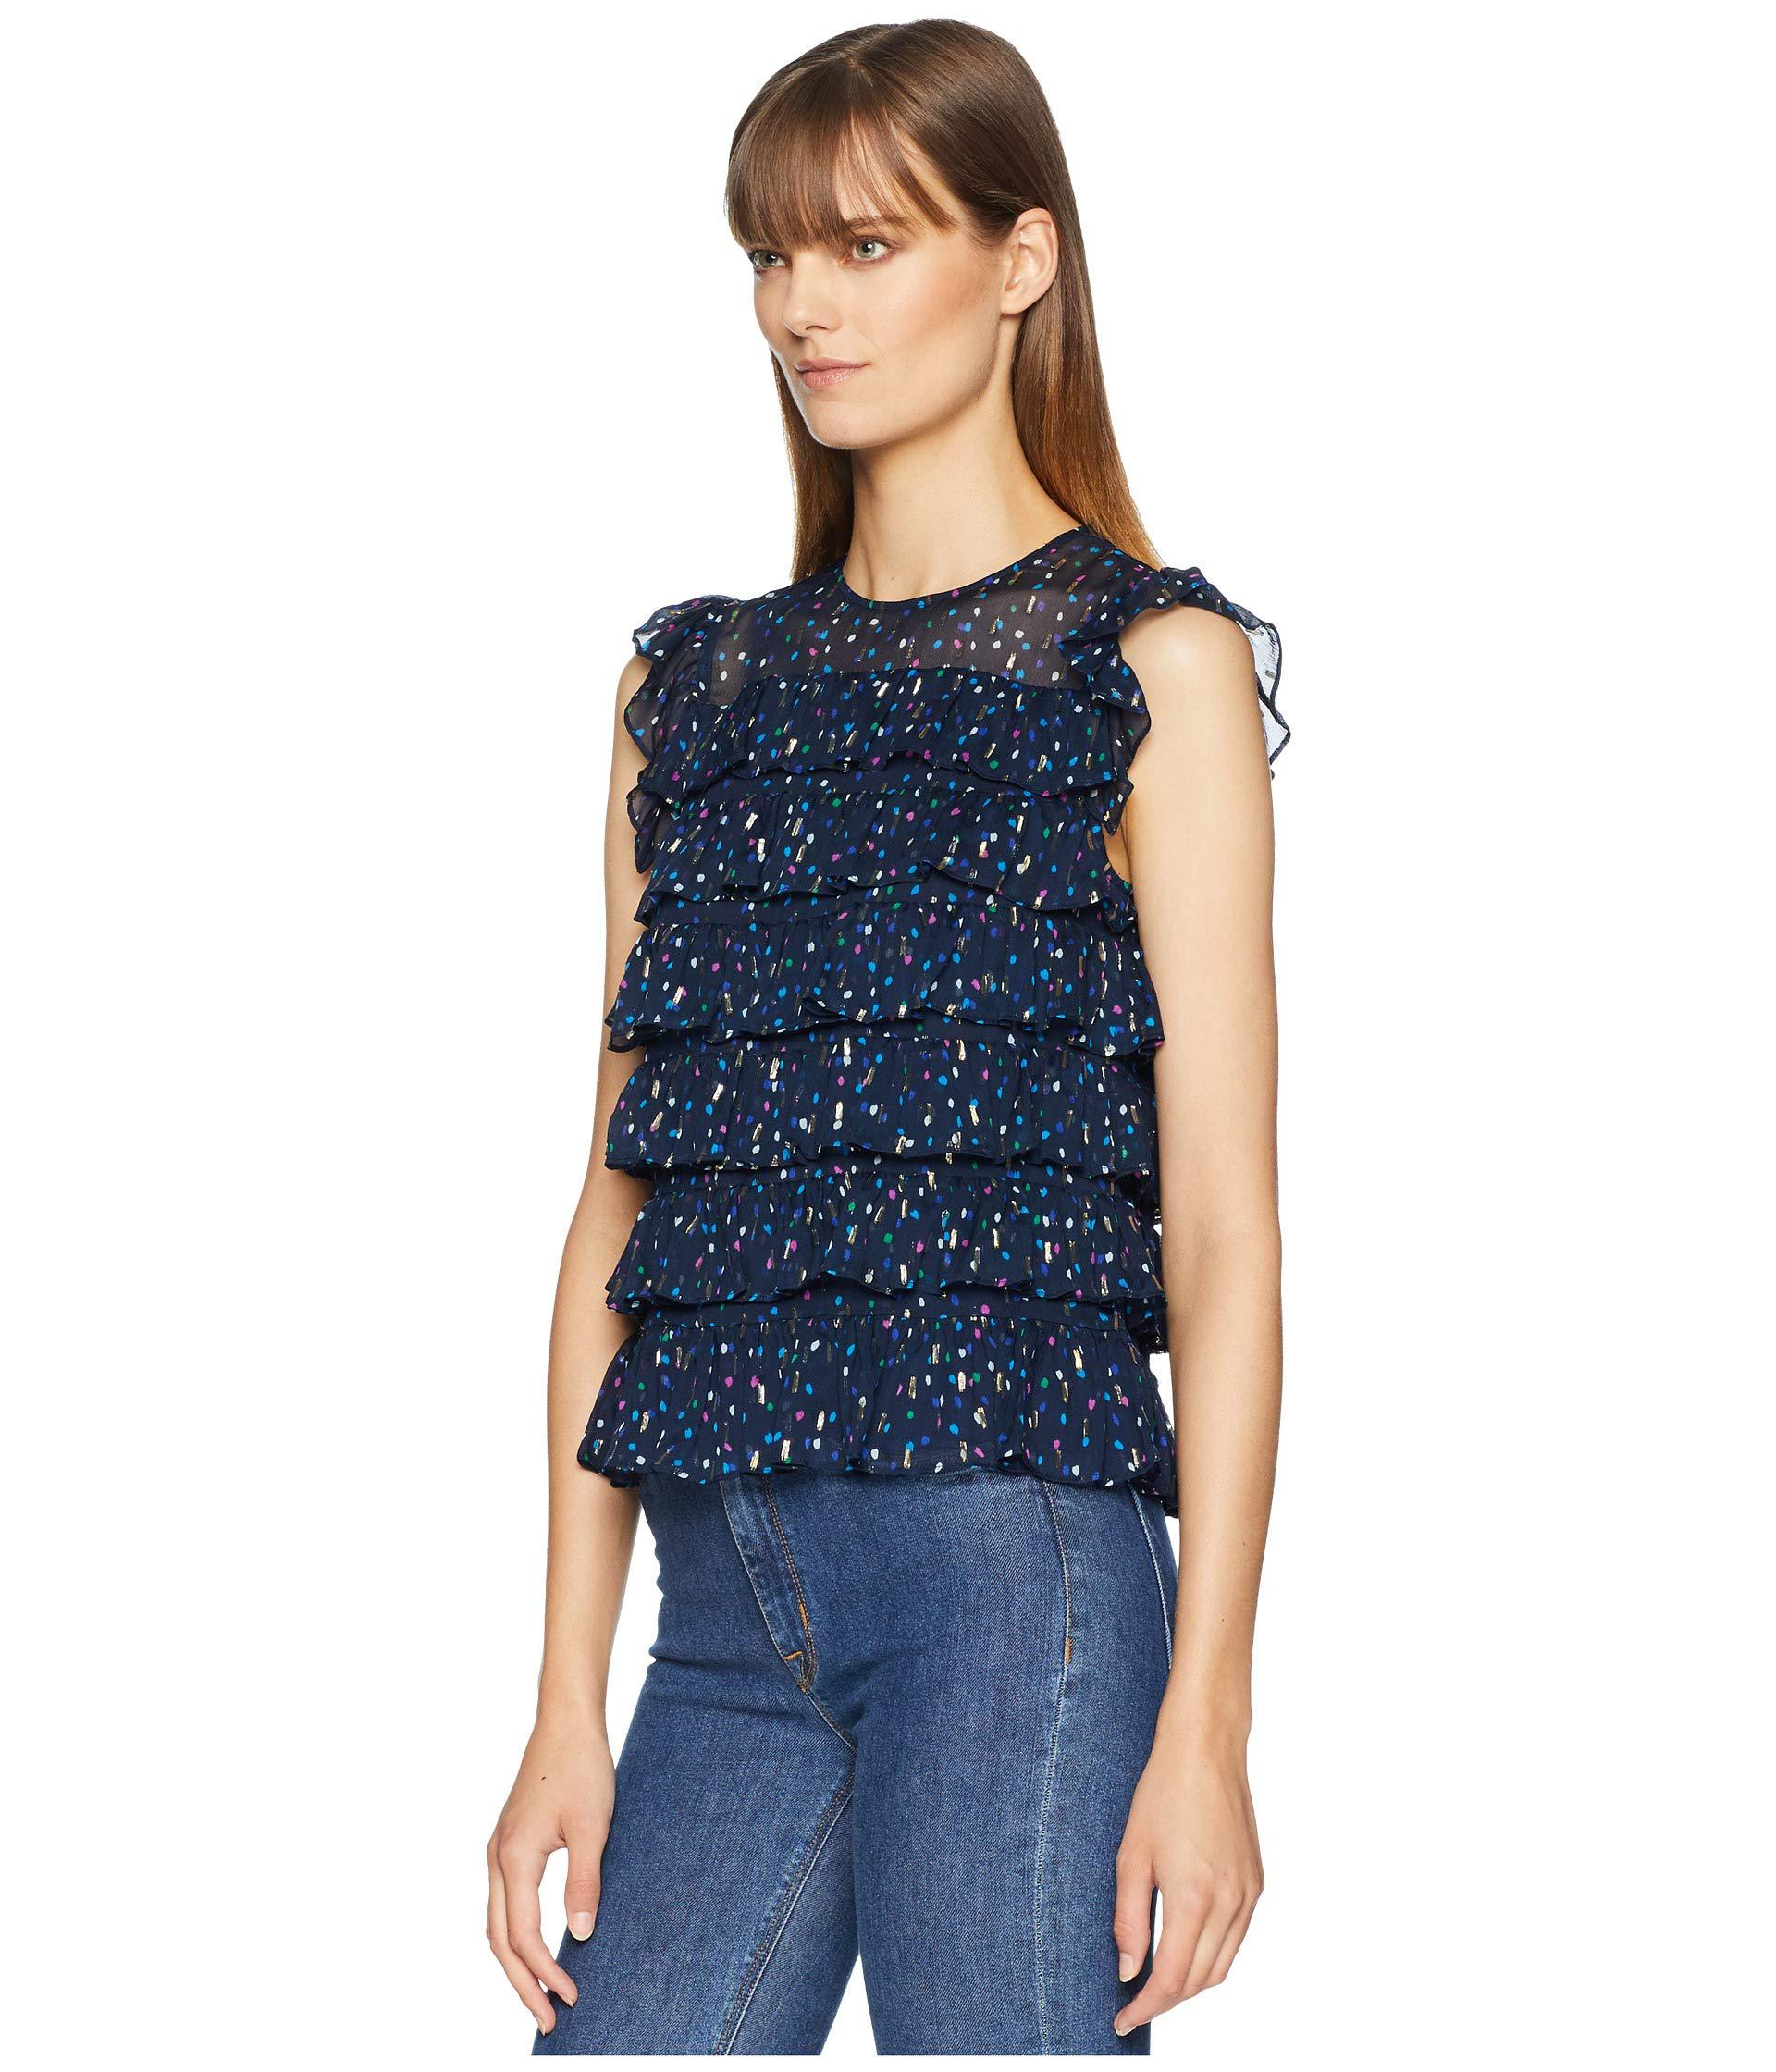 5513f745c34d1 Lyst - Rebecca Taylor Sleeveless Dot Ruffle Top (navy Combo) Women s  Sleeveless in Blue - Save 61%